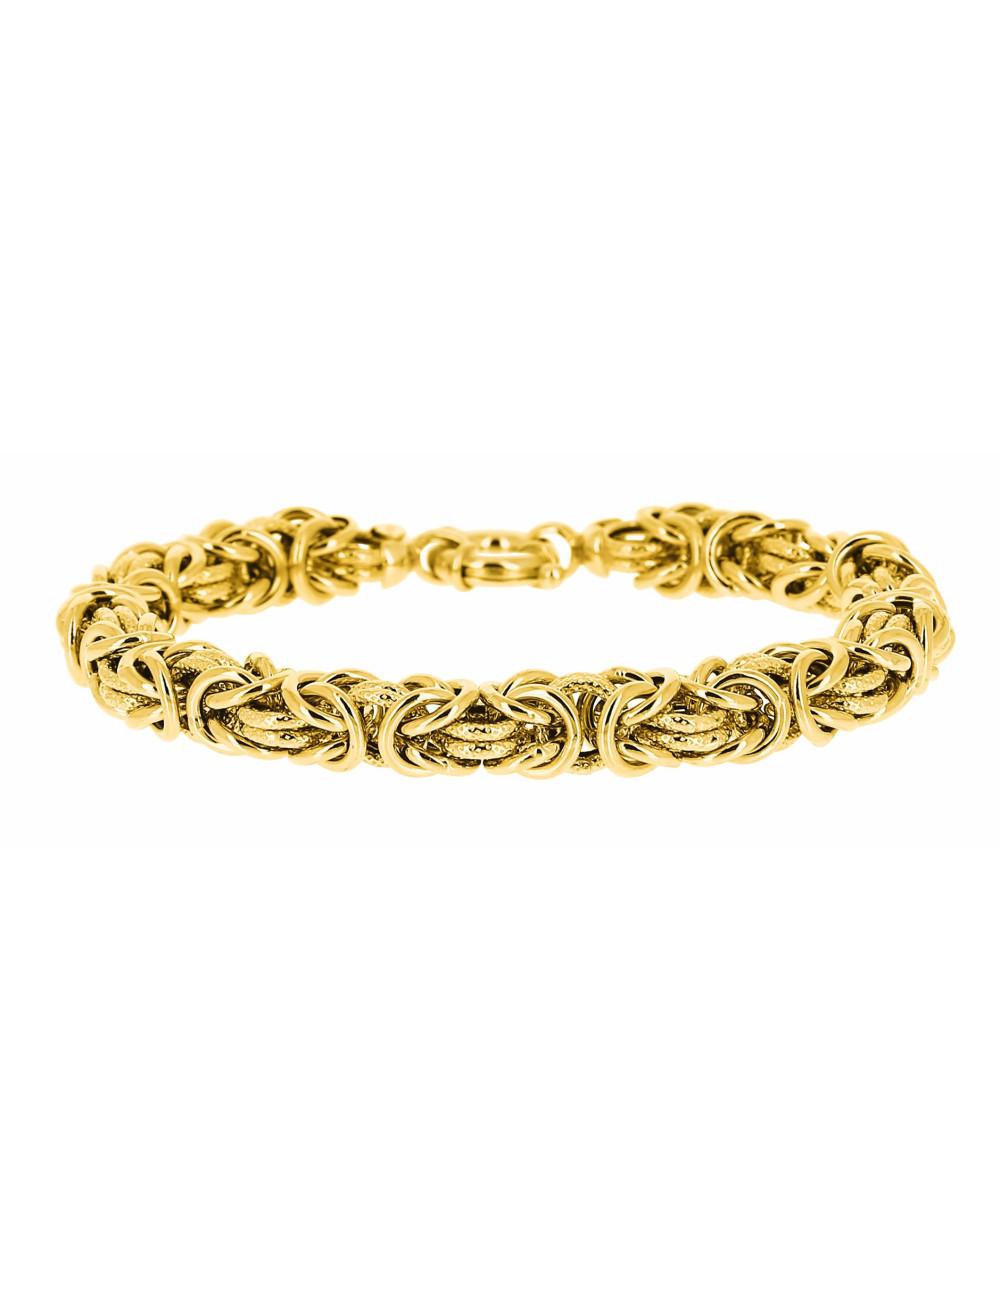 Bracelet Maille Royale Or Jaune 750/1000